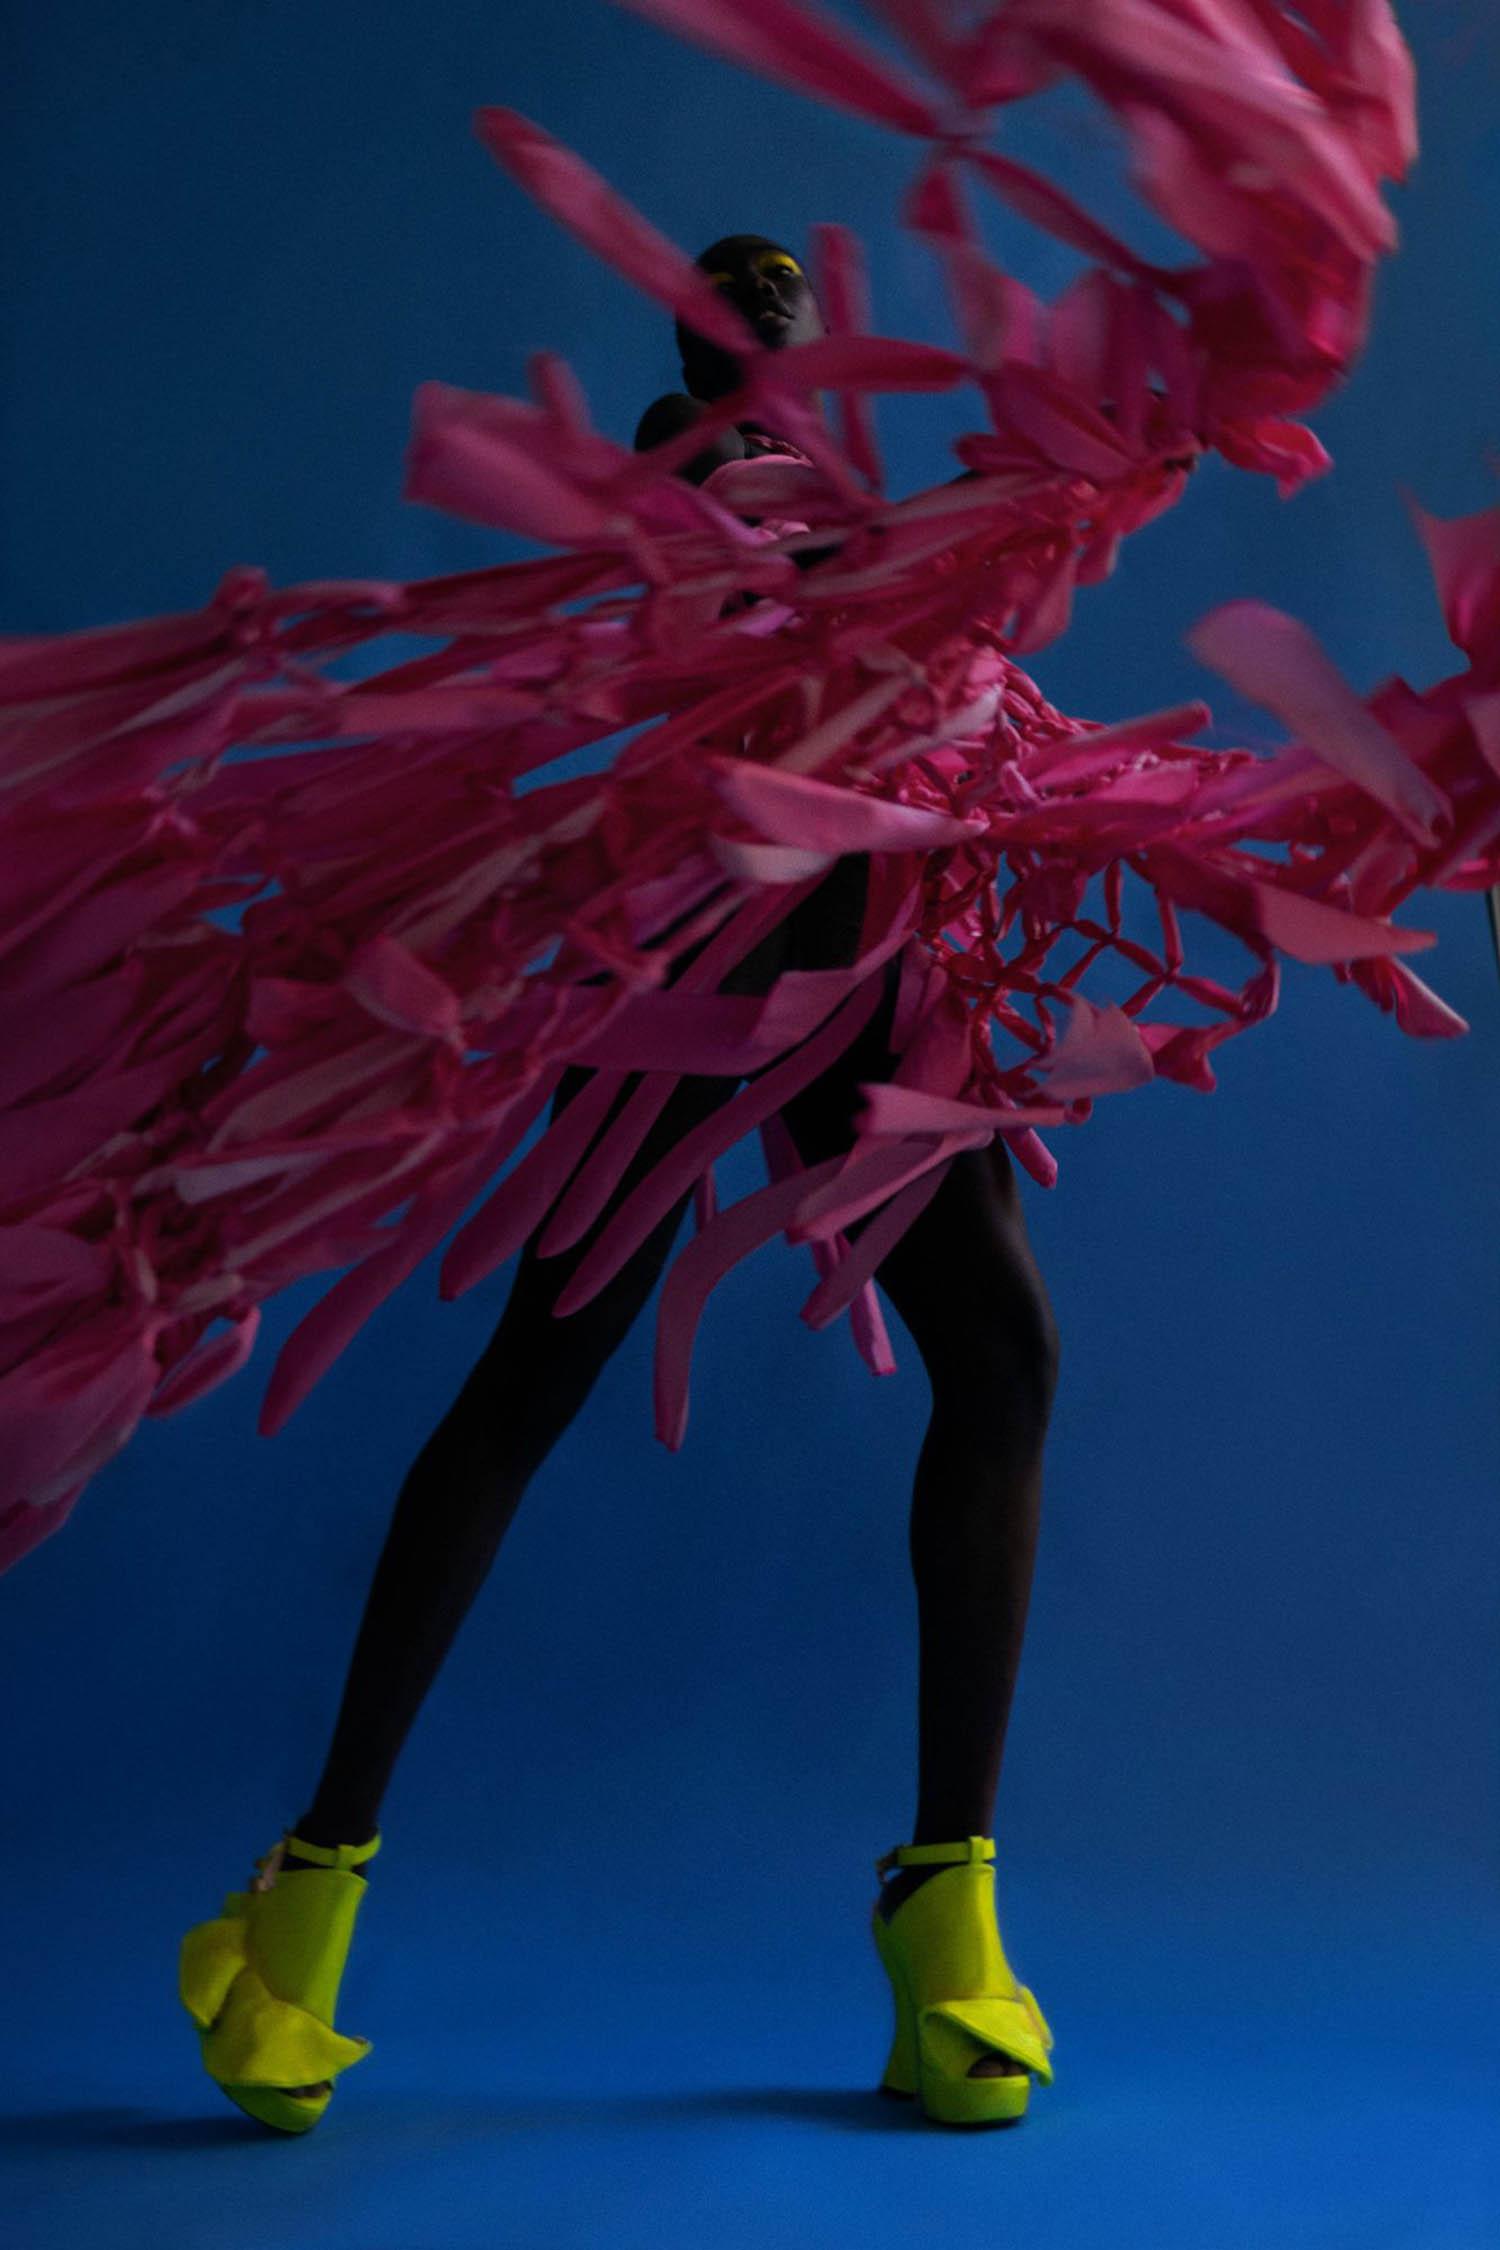 Lily Fofana by Álvaro Gracia for Vogue Portugal June 2021